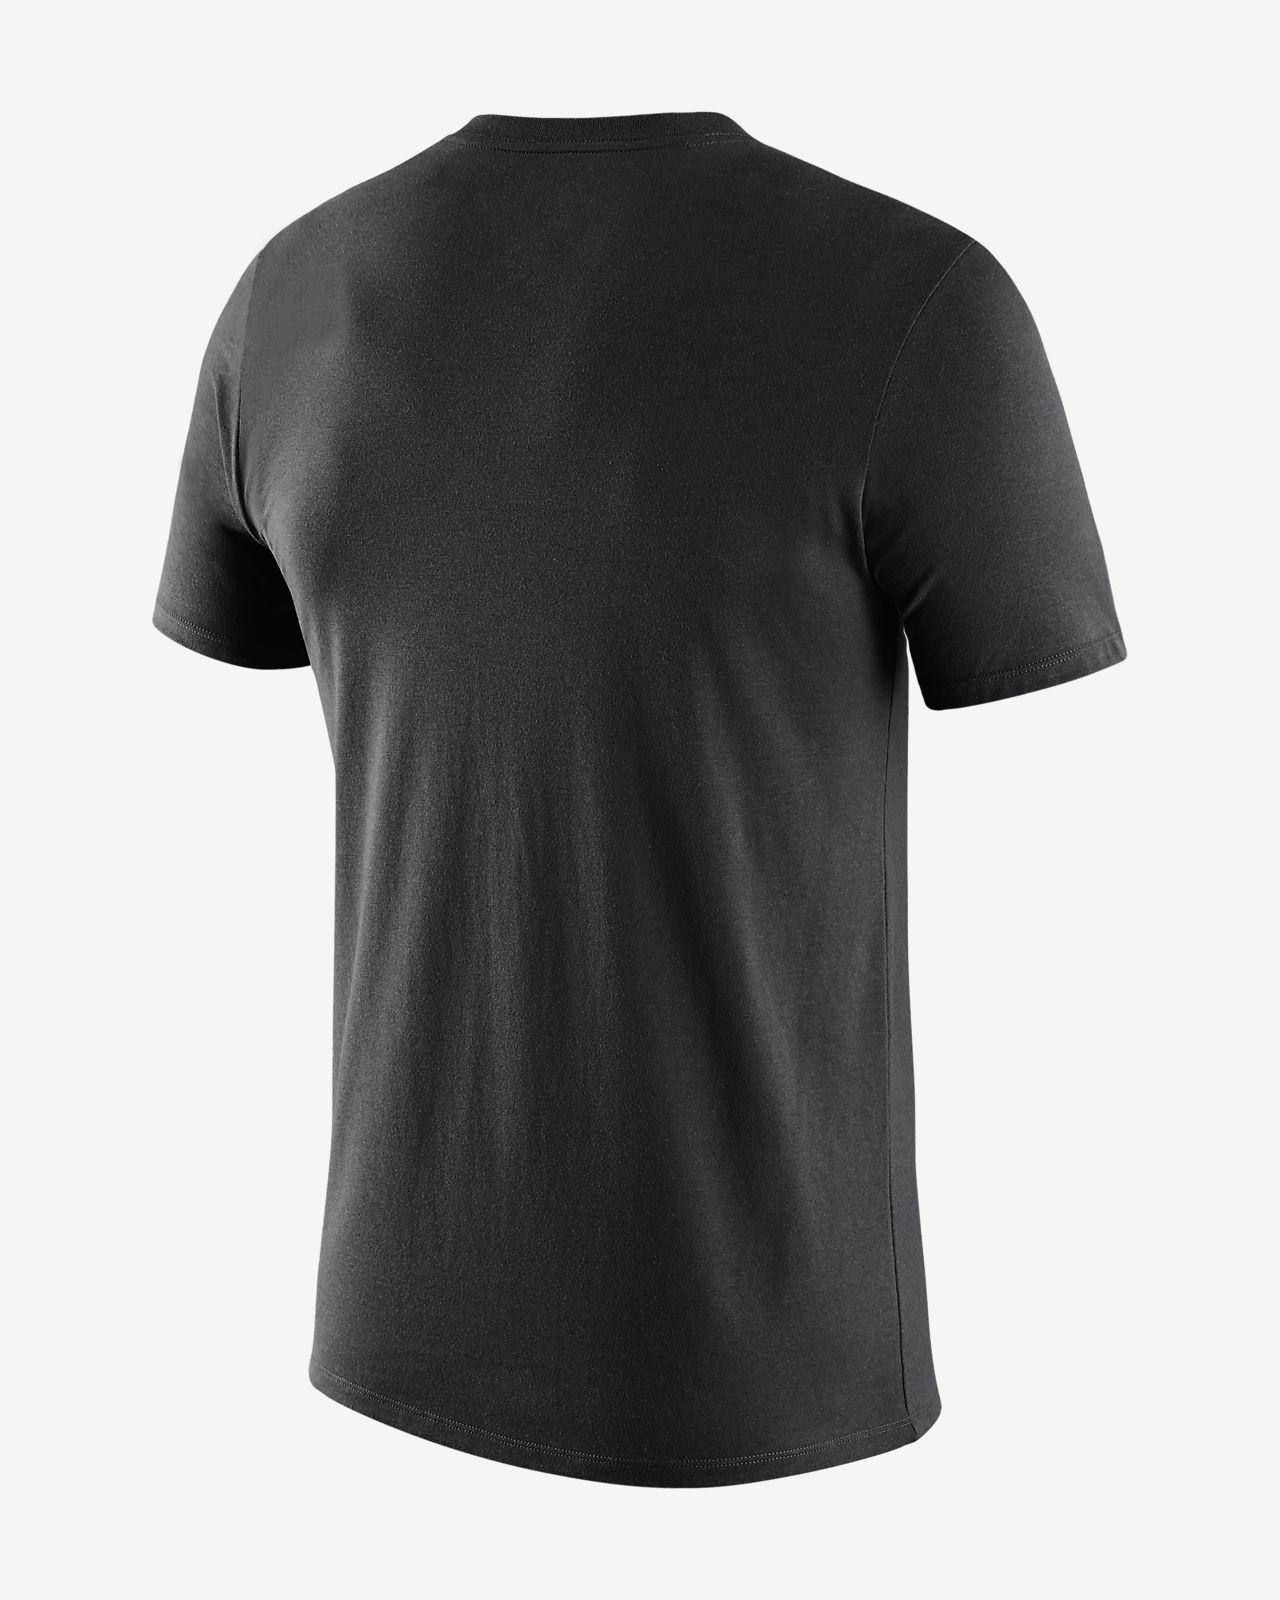 c67d29f7a0f1a Stephen Curry Golden State Warriors Nike Dri-FIT Men's NBA T-Shirt ...